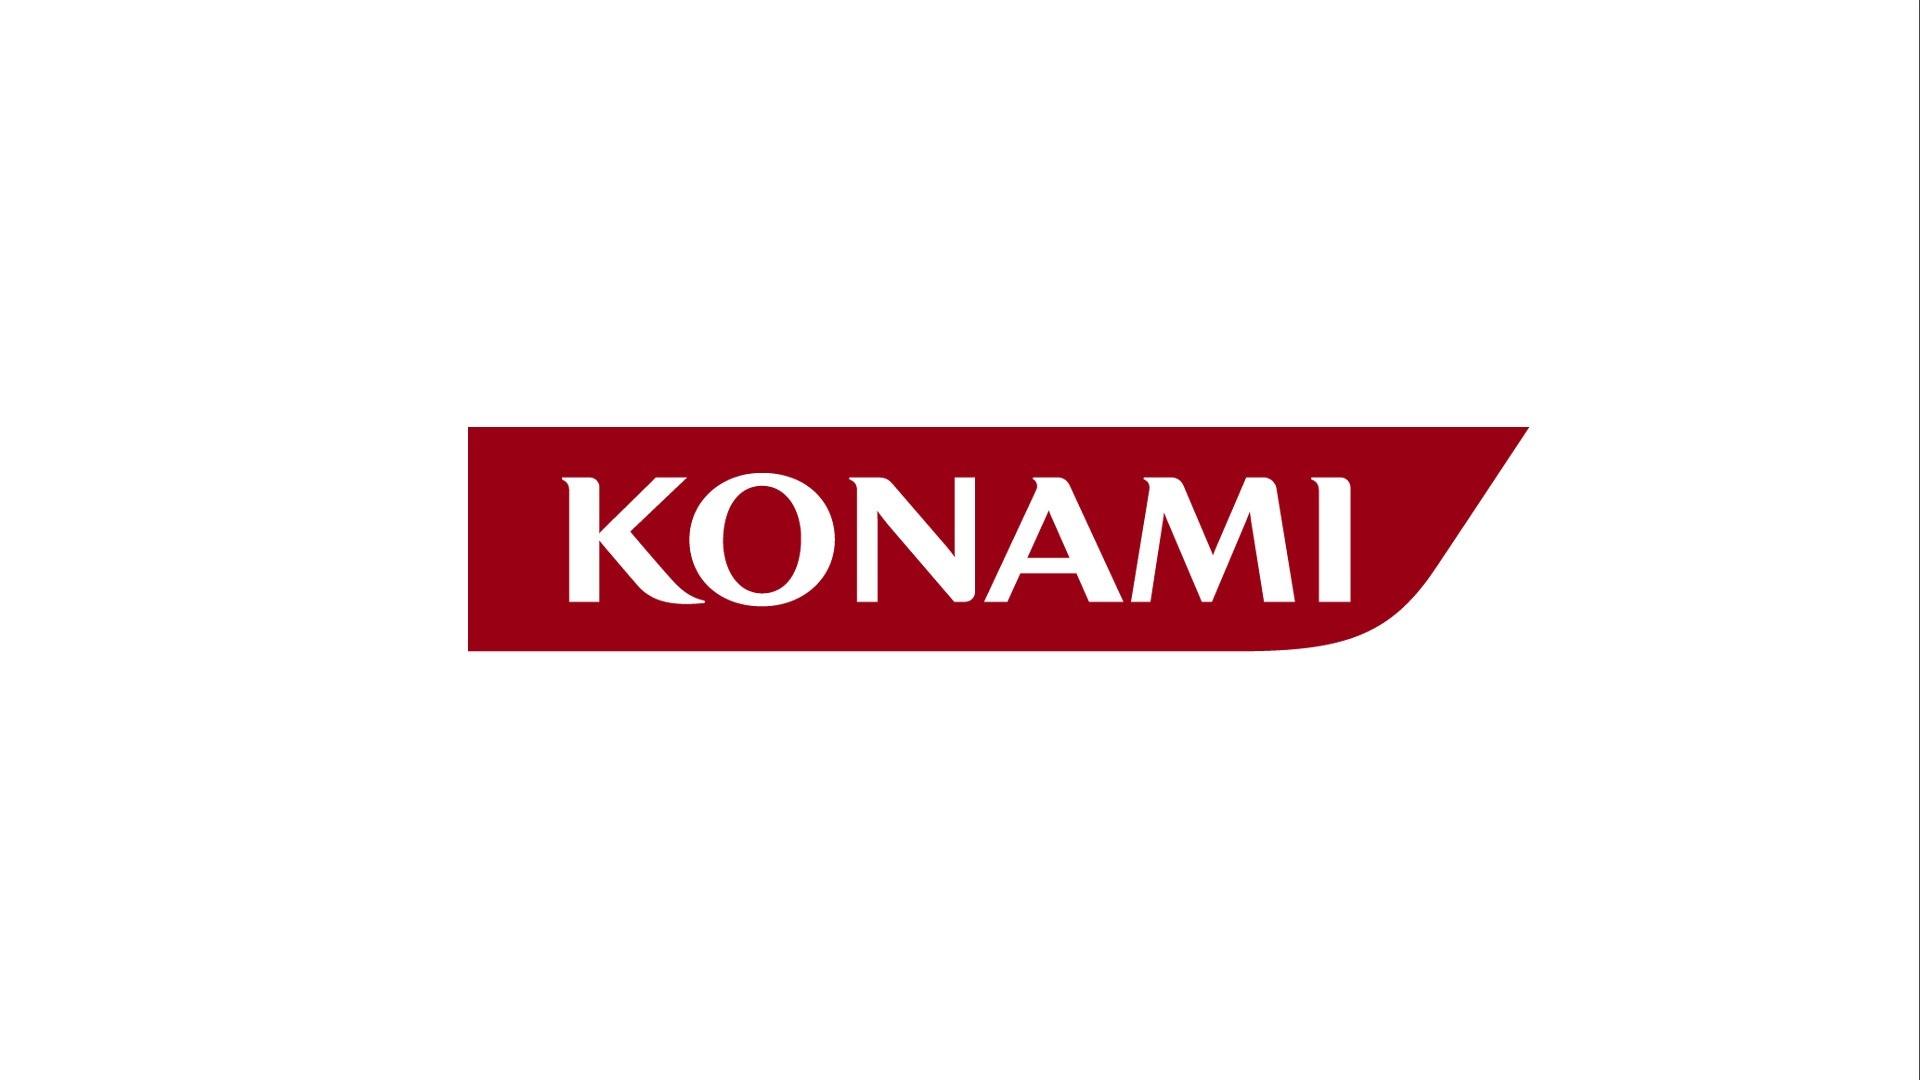 Konami big logo